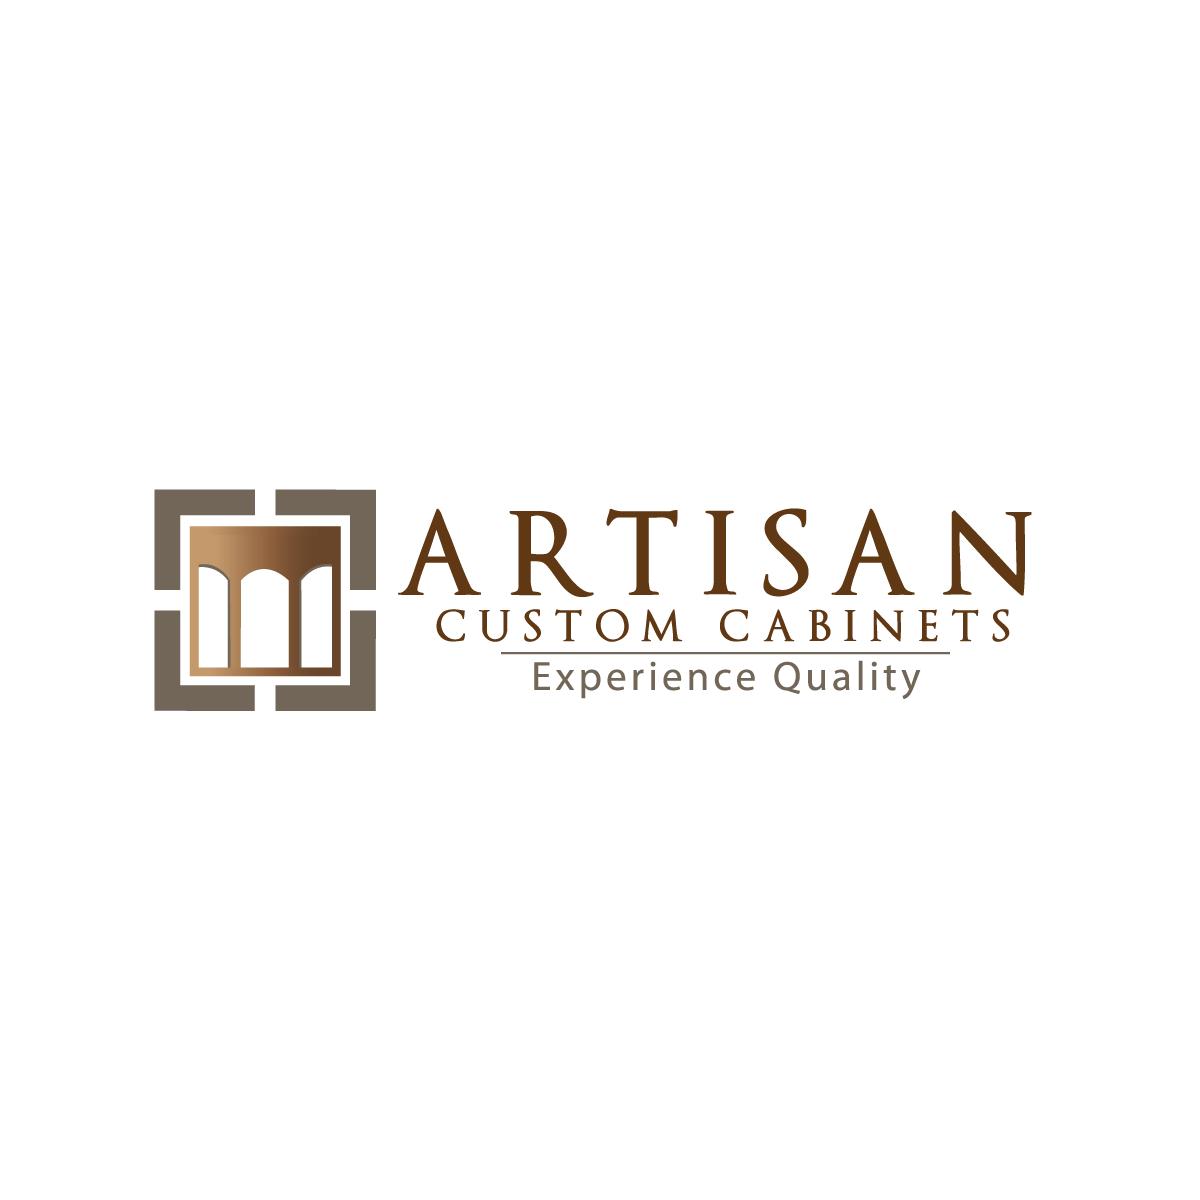 Logo Design by rockin - Entry No. 106 in the Logo Design Contest Creative Logo Design for Artisan Custom Cabinets.